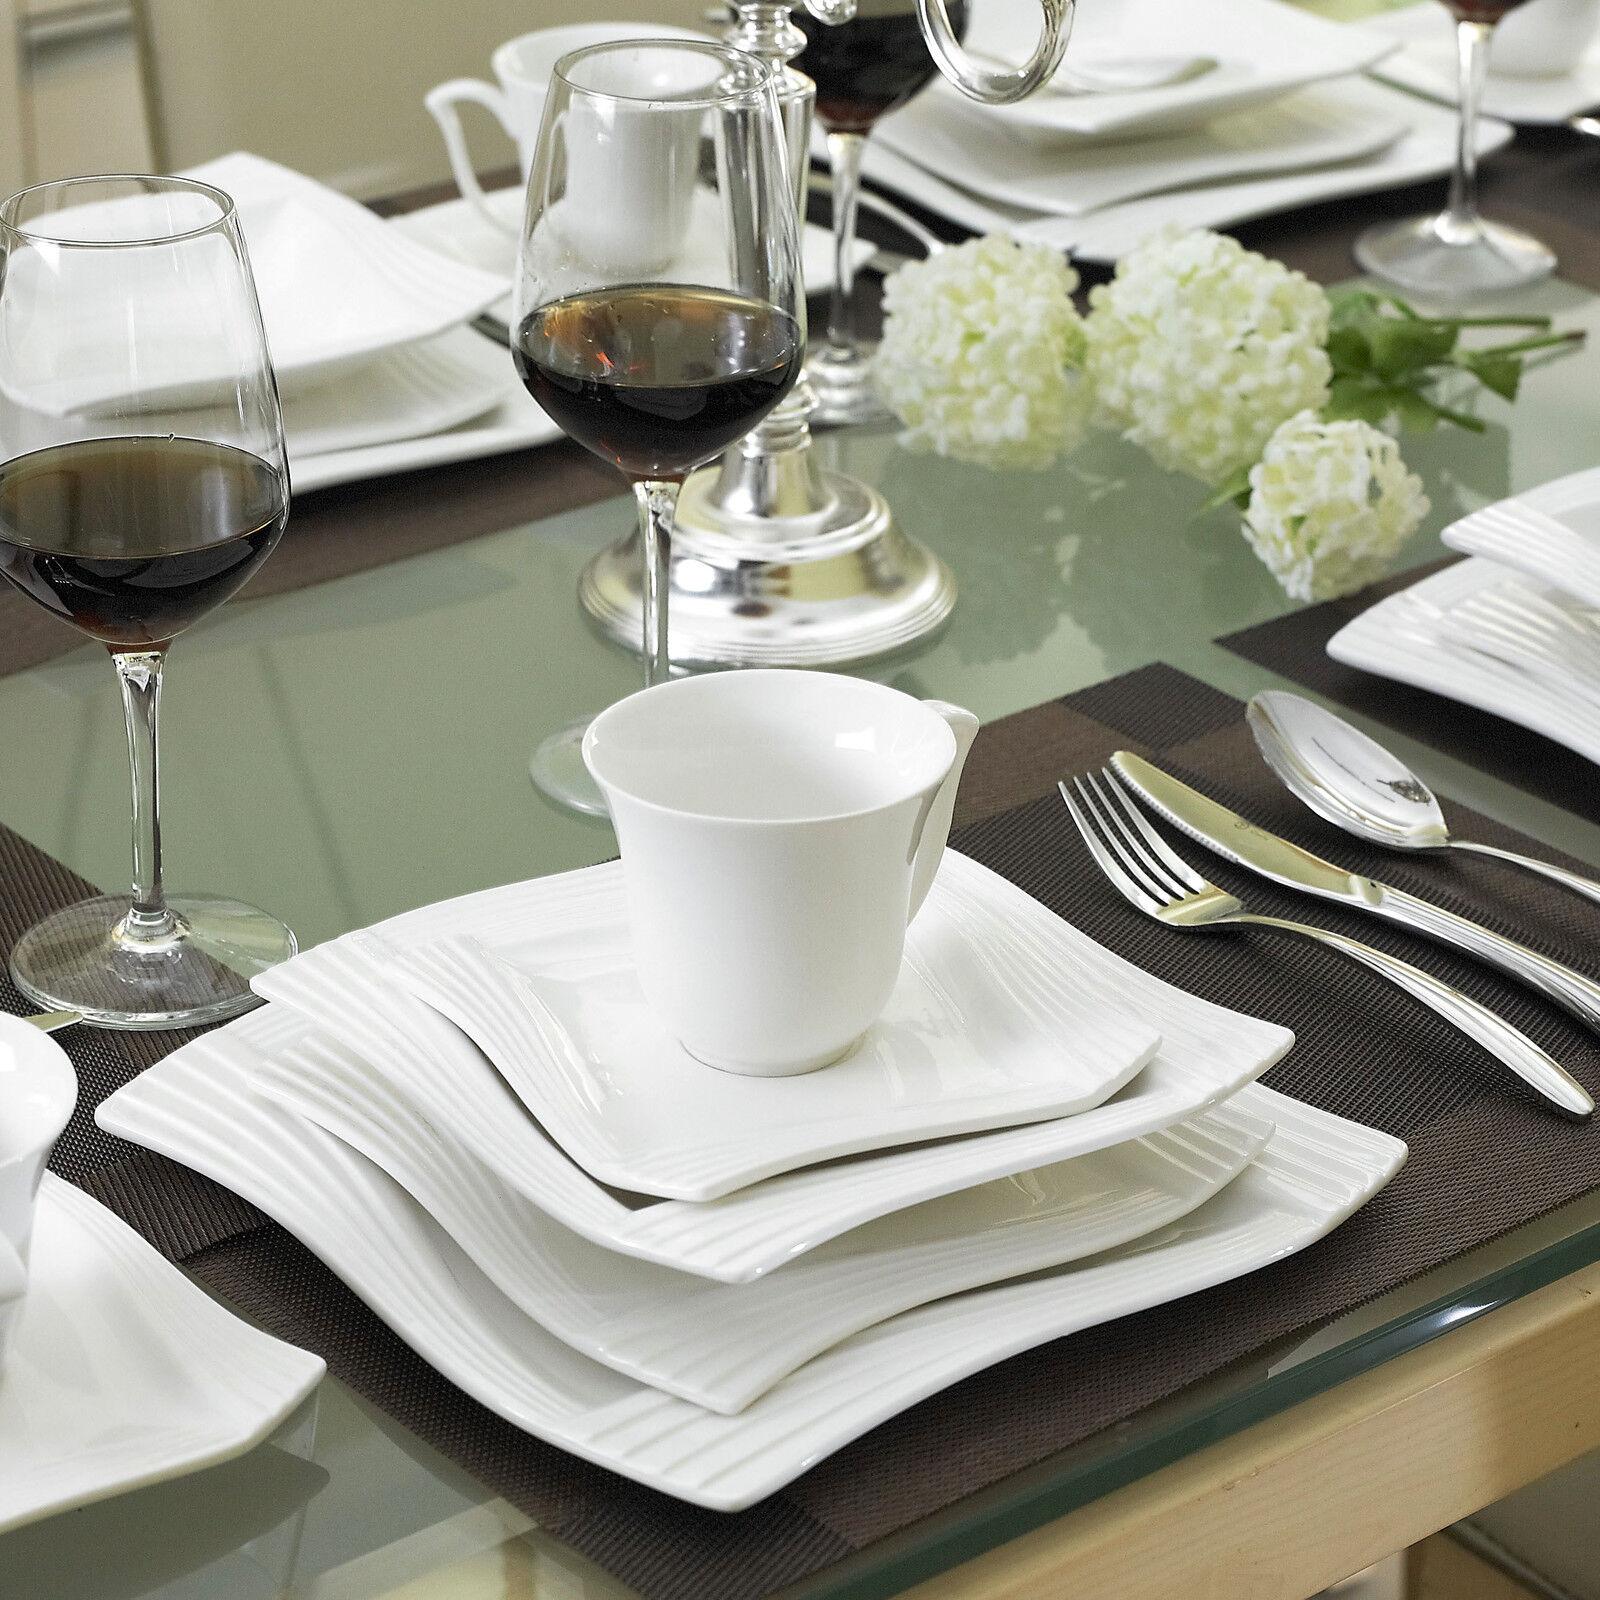 30pcs Square Porcelain Crockery Ceramic Dinner Service